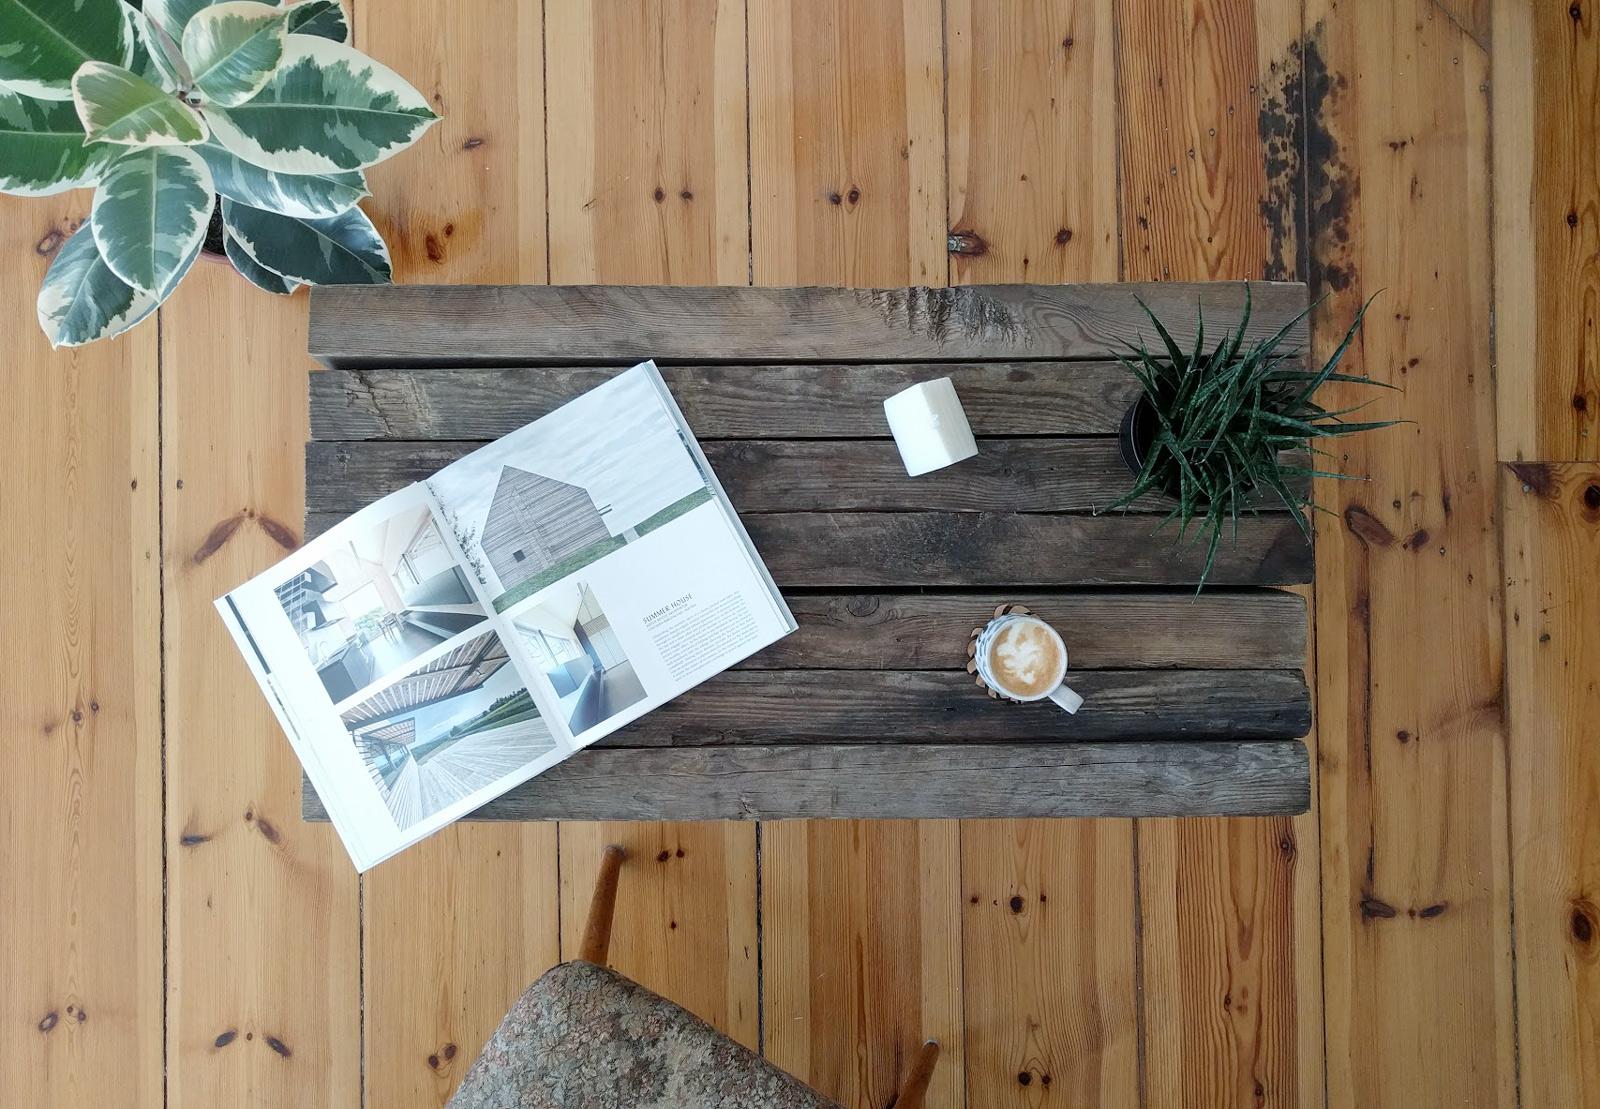 coffeetable-02.jpg